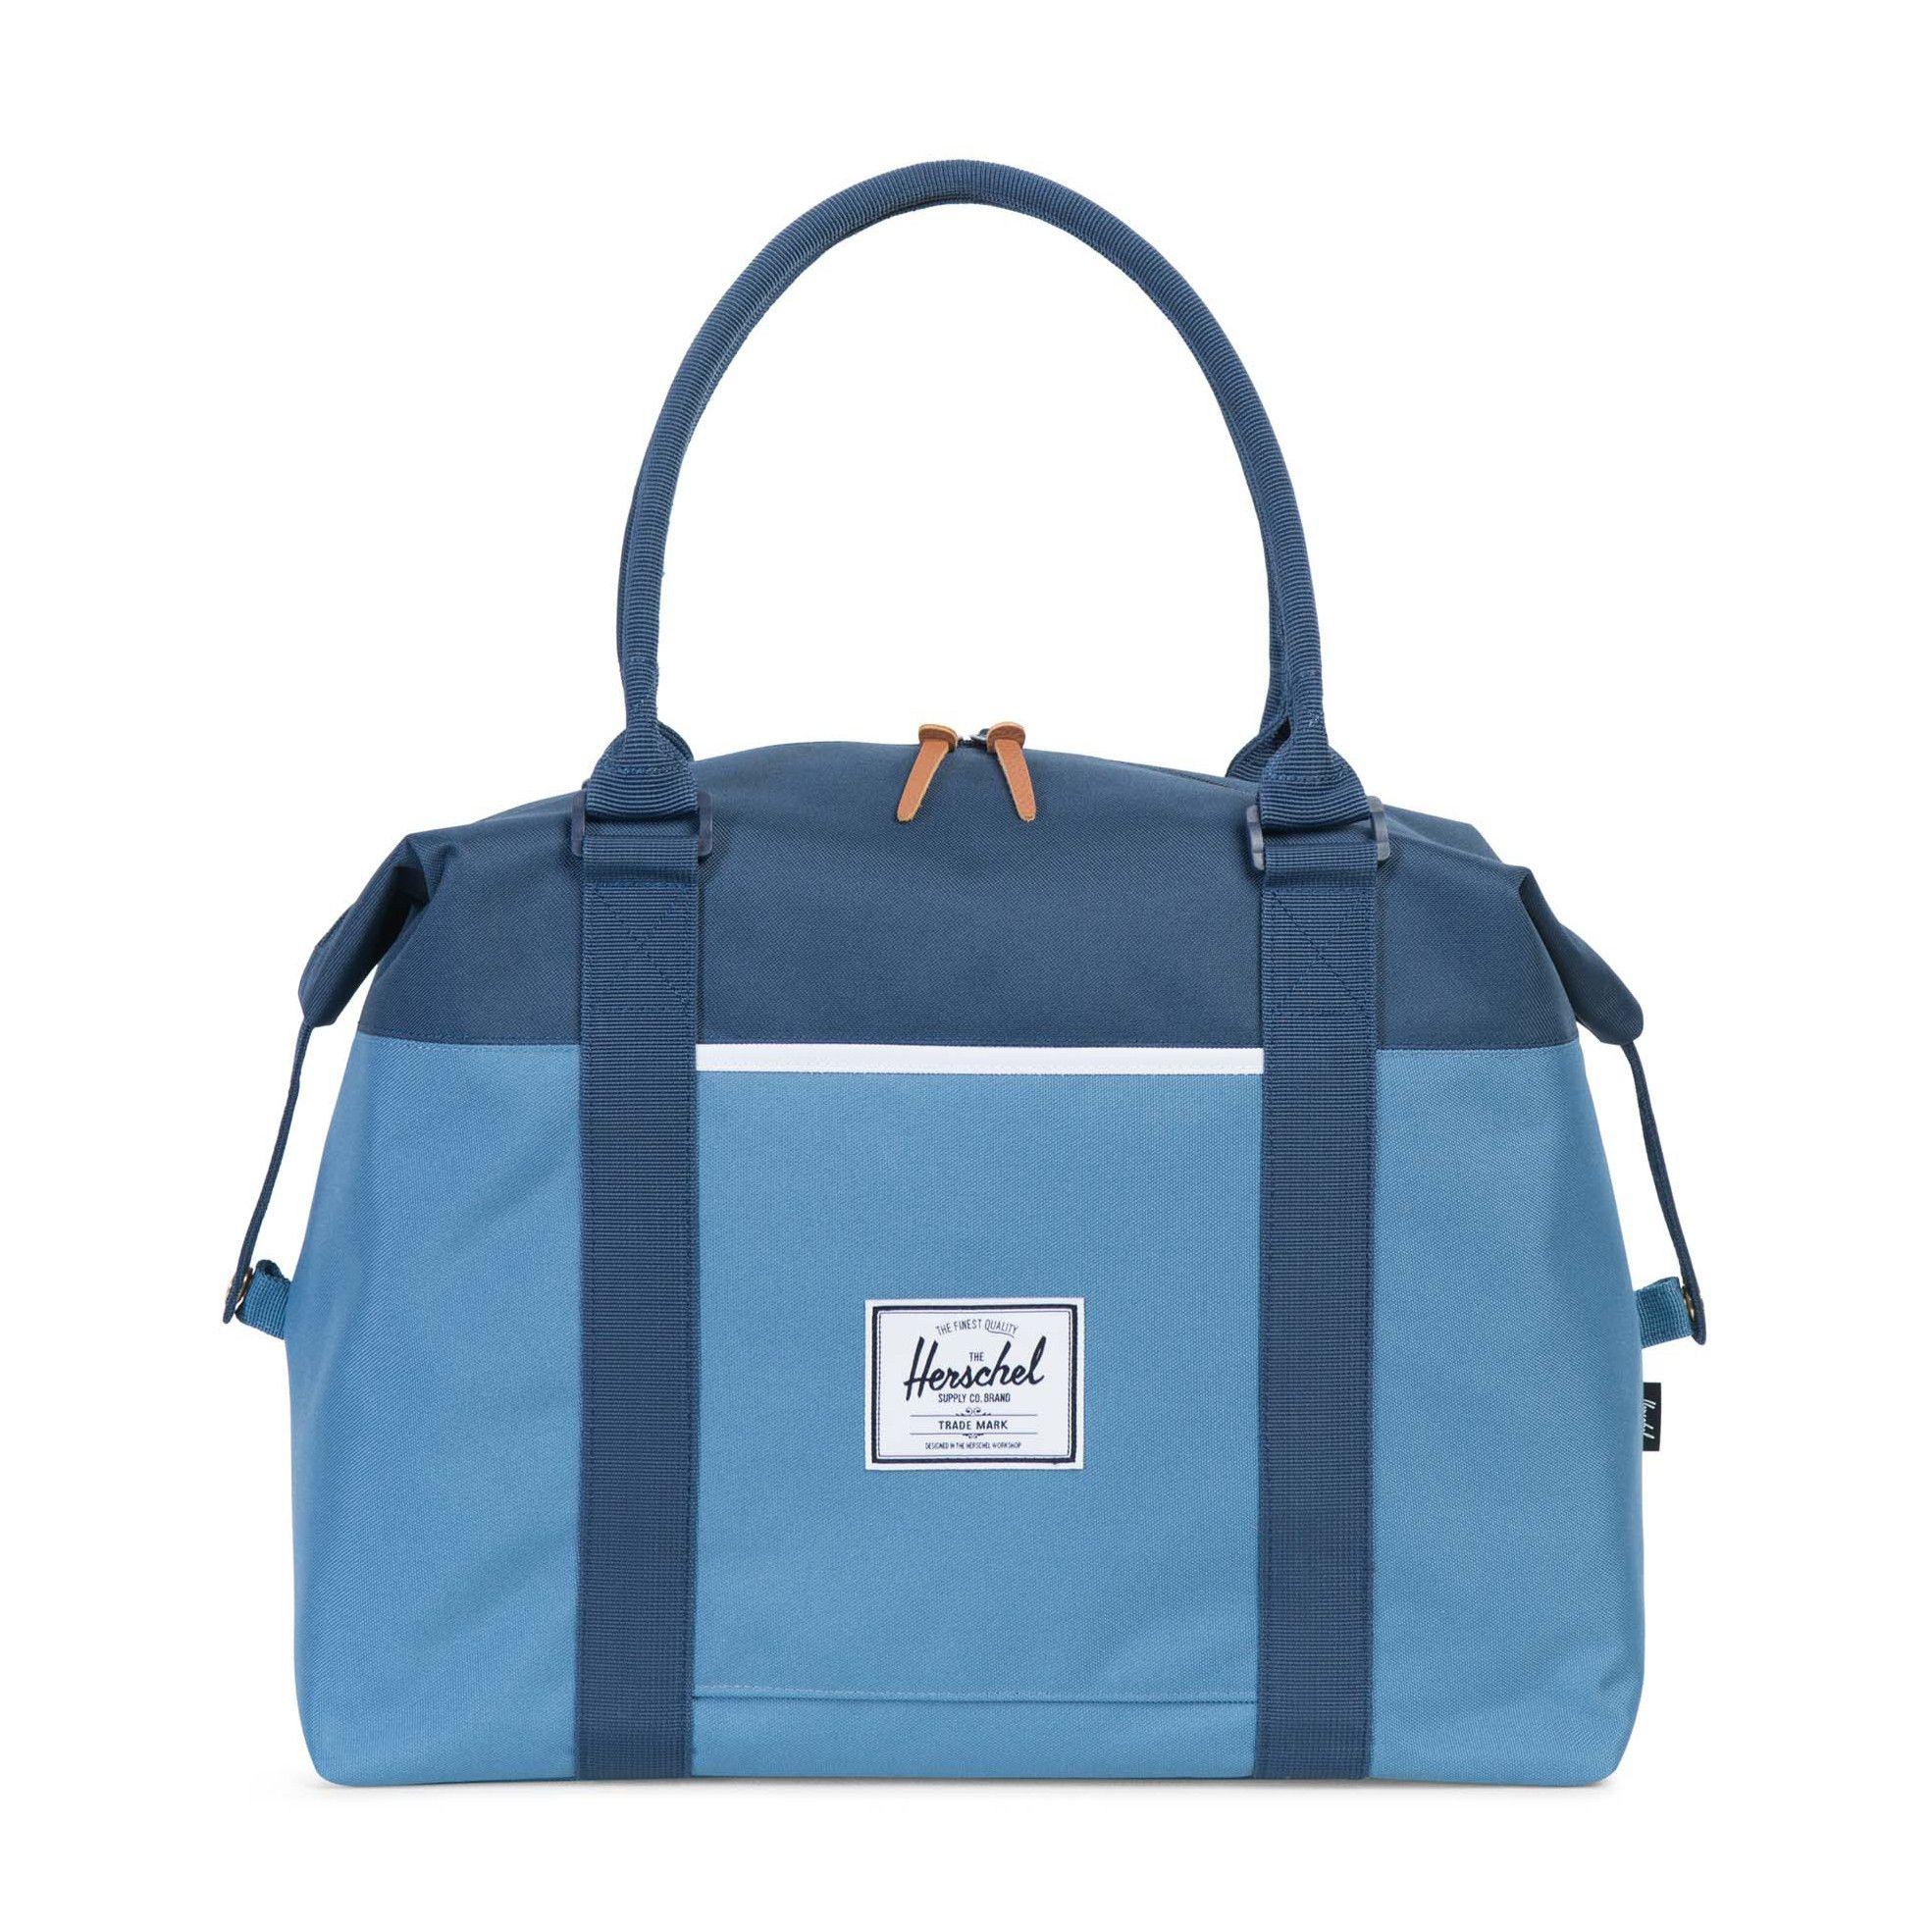 STRAND 600D POLY CAPTAIN'S BLUE/NAVY DUFFLE BAG - $64.99